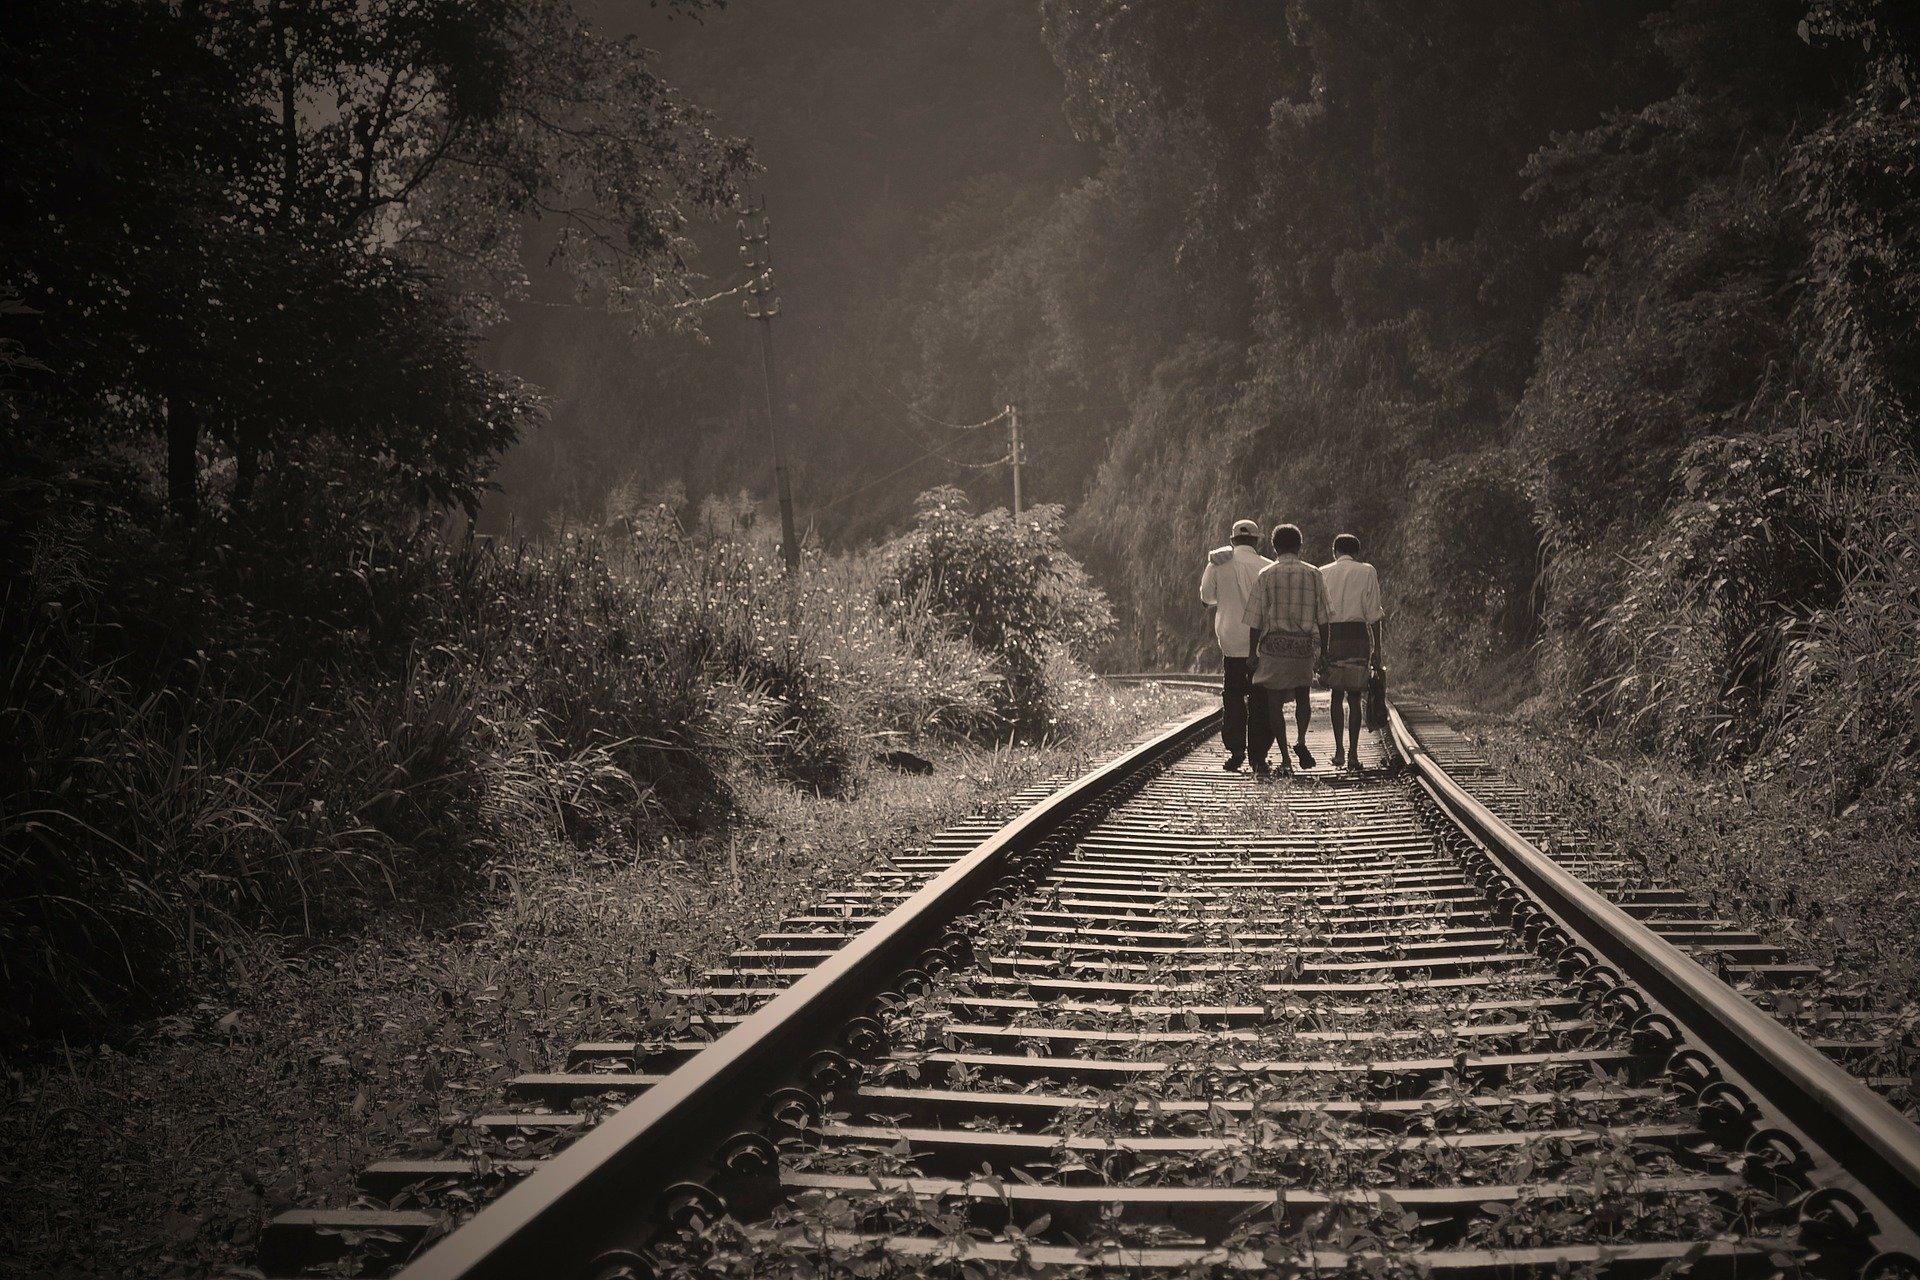 rail-road-191097_1920.jpg